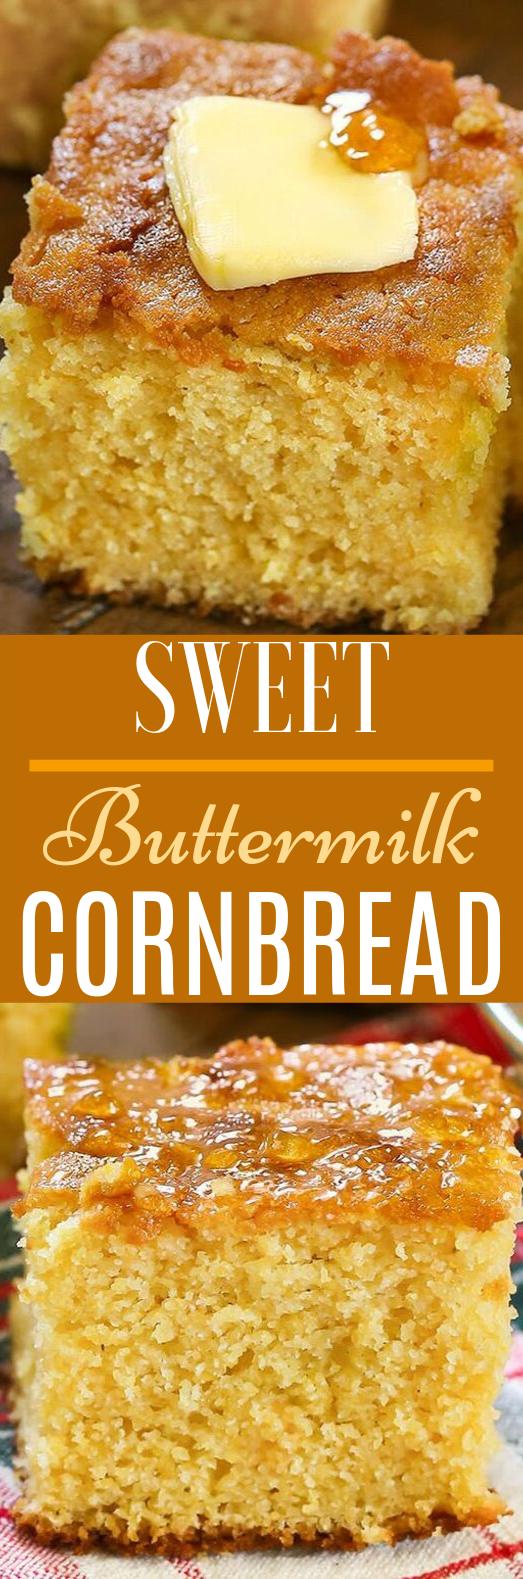 Sweet Buttermilk Cornbread #cake #desserts